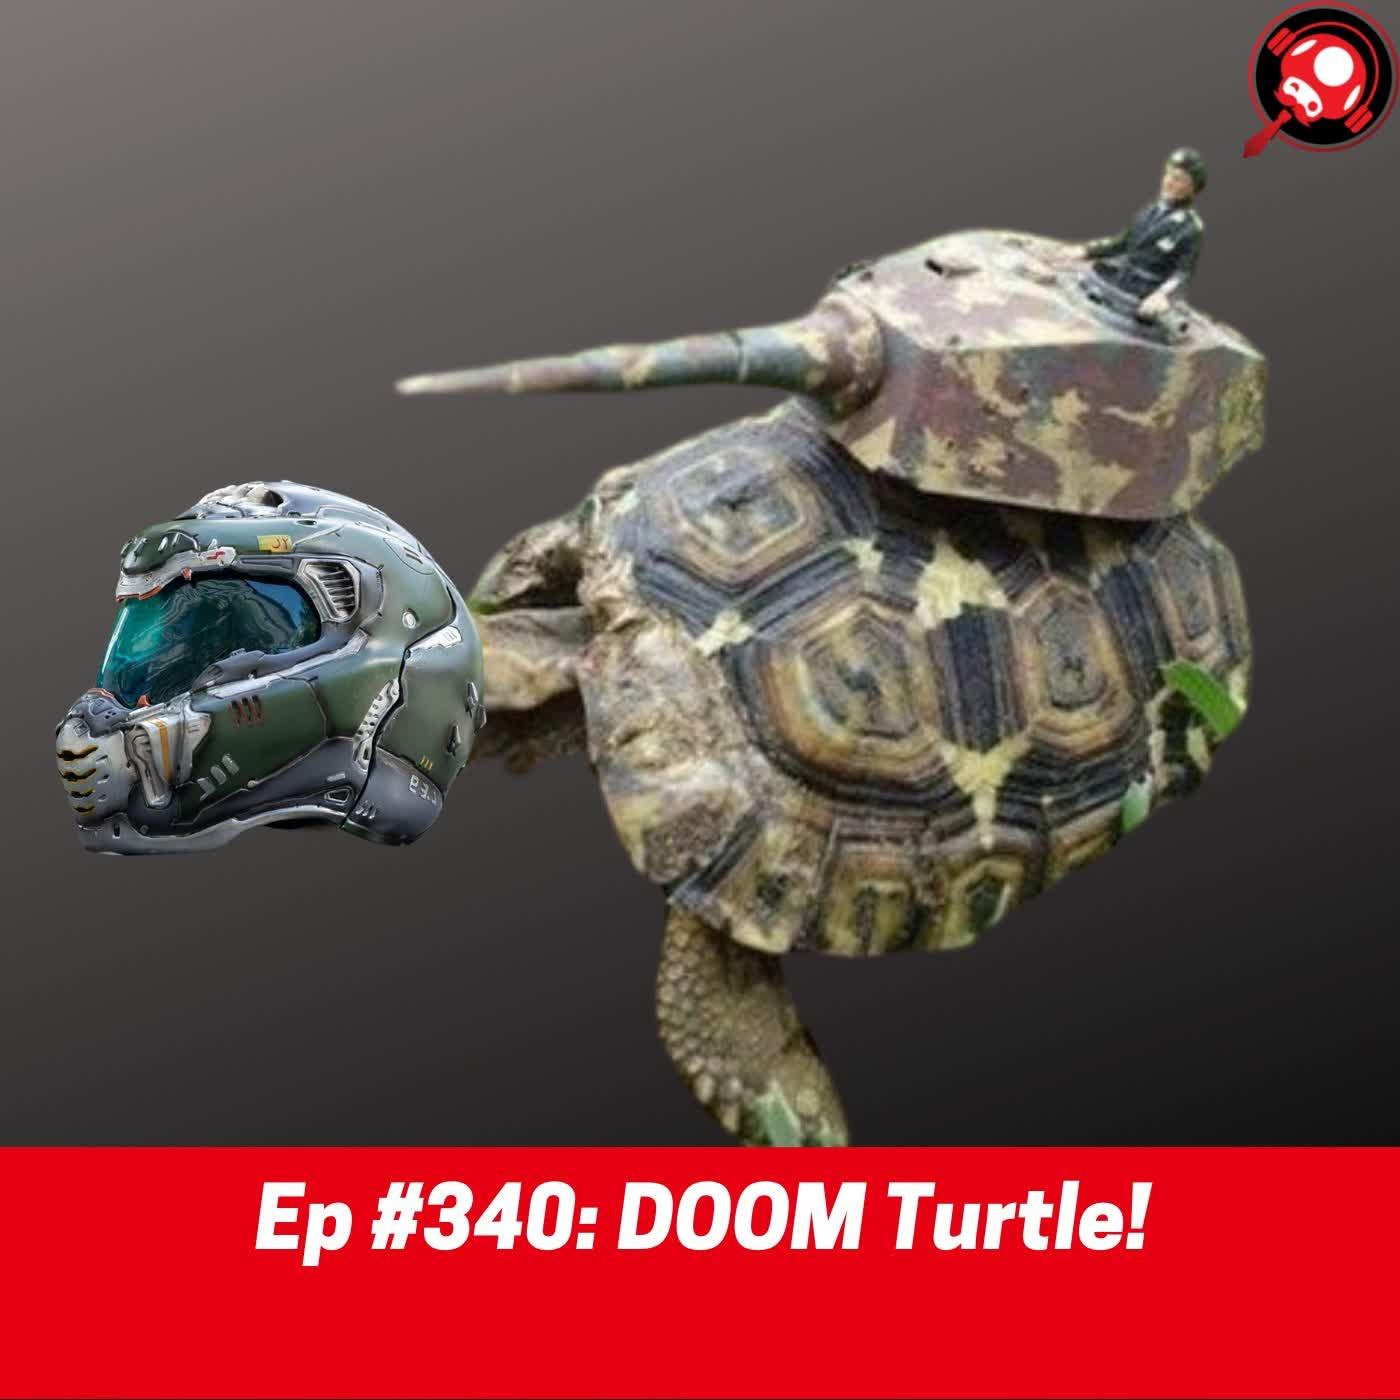 #340: DOOM Turtle!